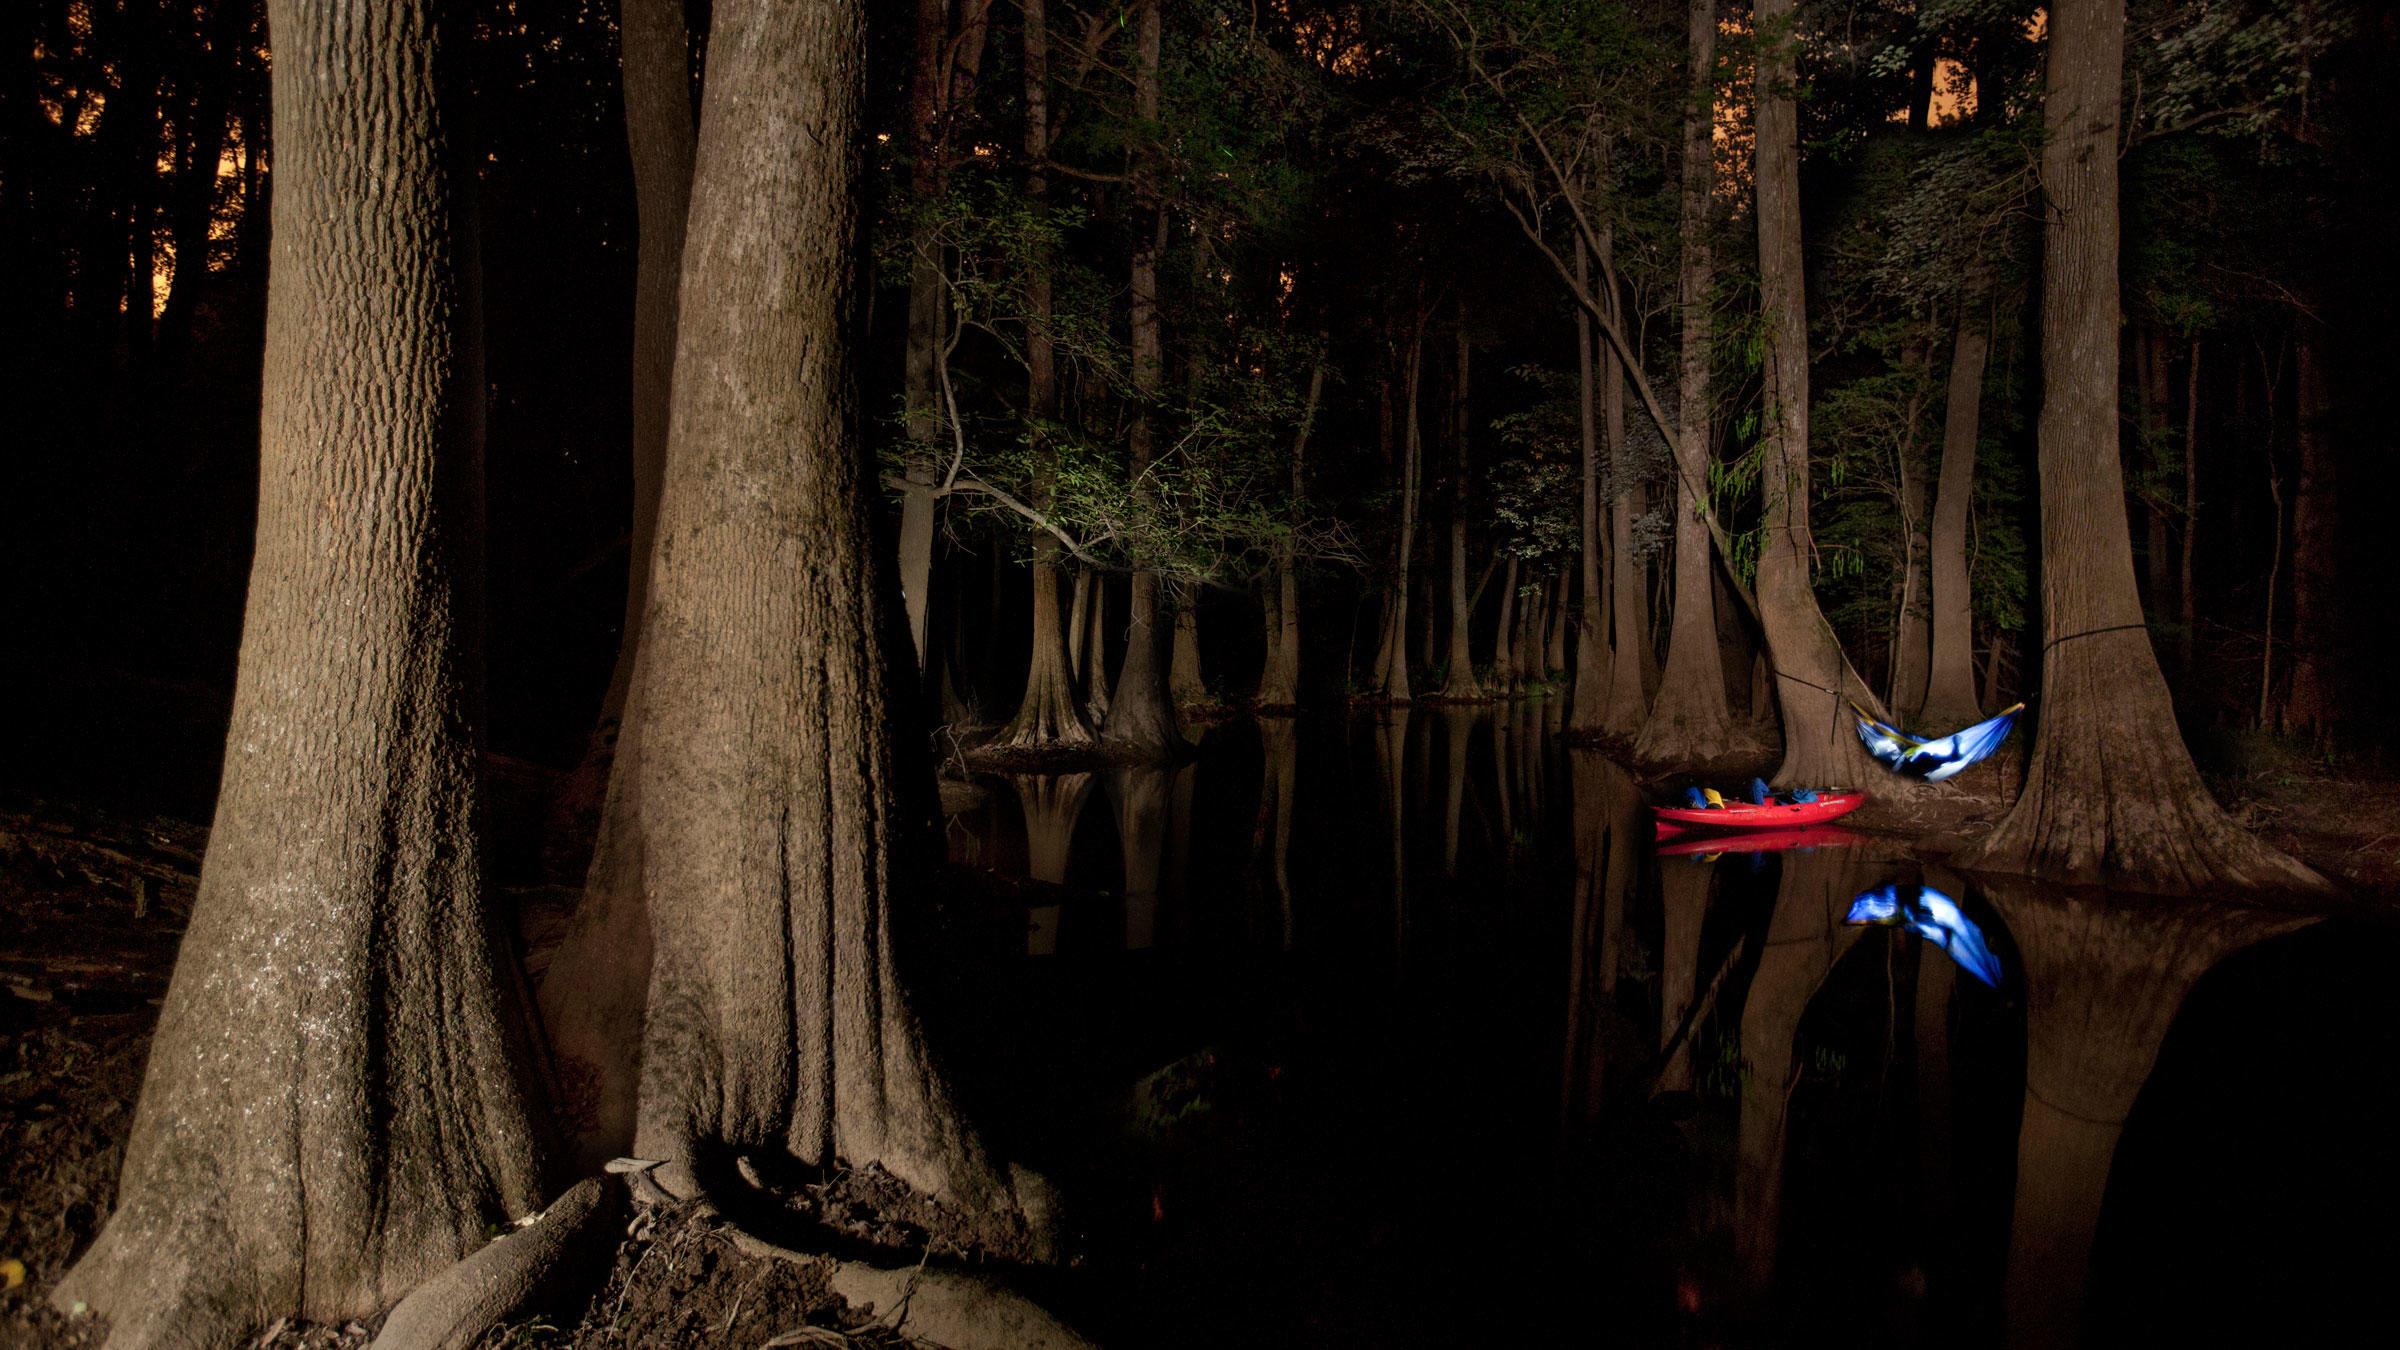 A makeshift hammock on Cedar Creek in Congaree National Park, South Carolina. Mac Stone